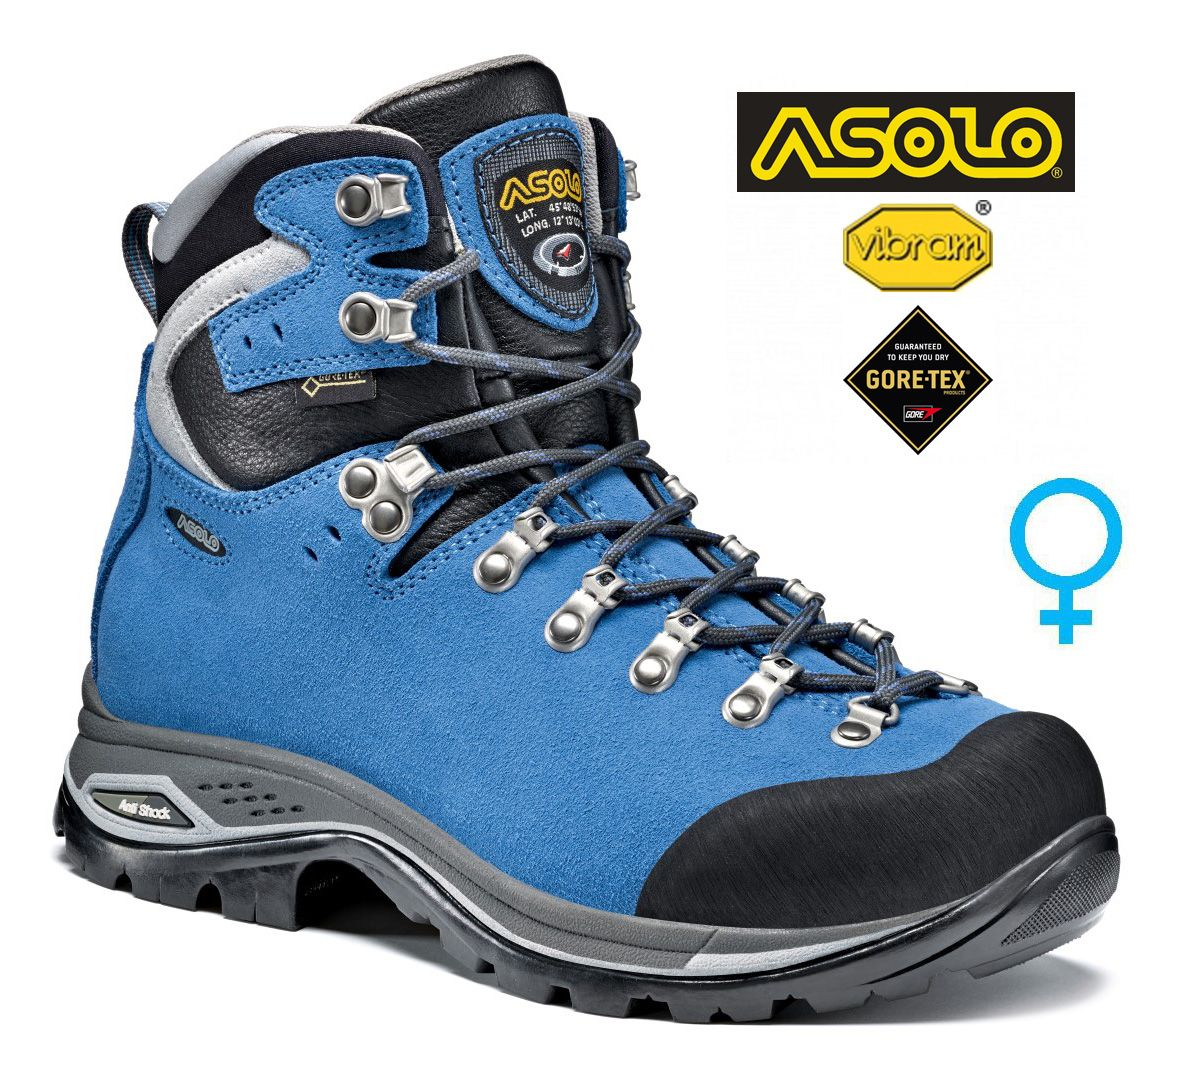 Asolo Greenwood GV ML woman celestial dámská treková bota